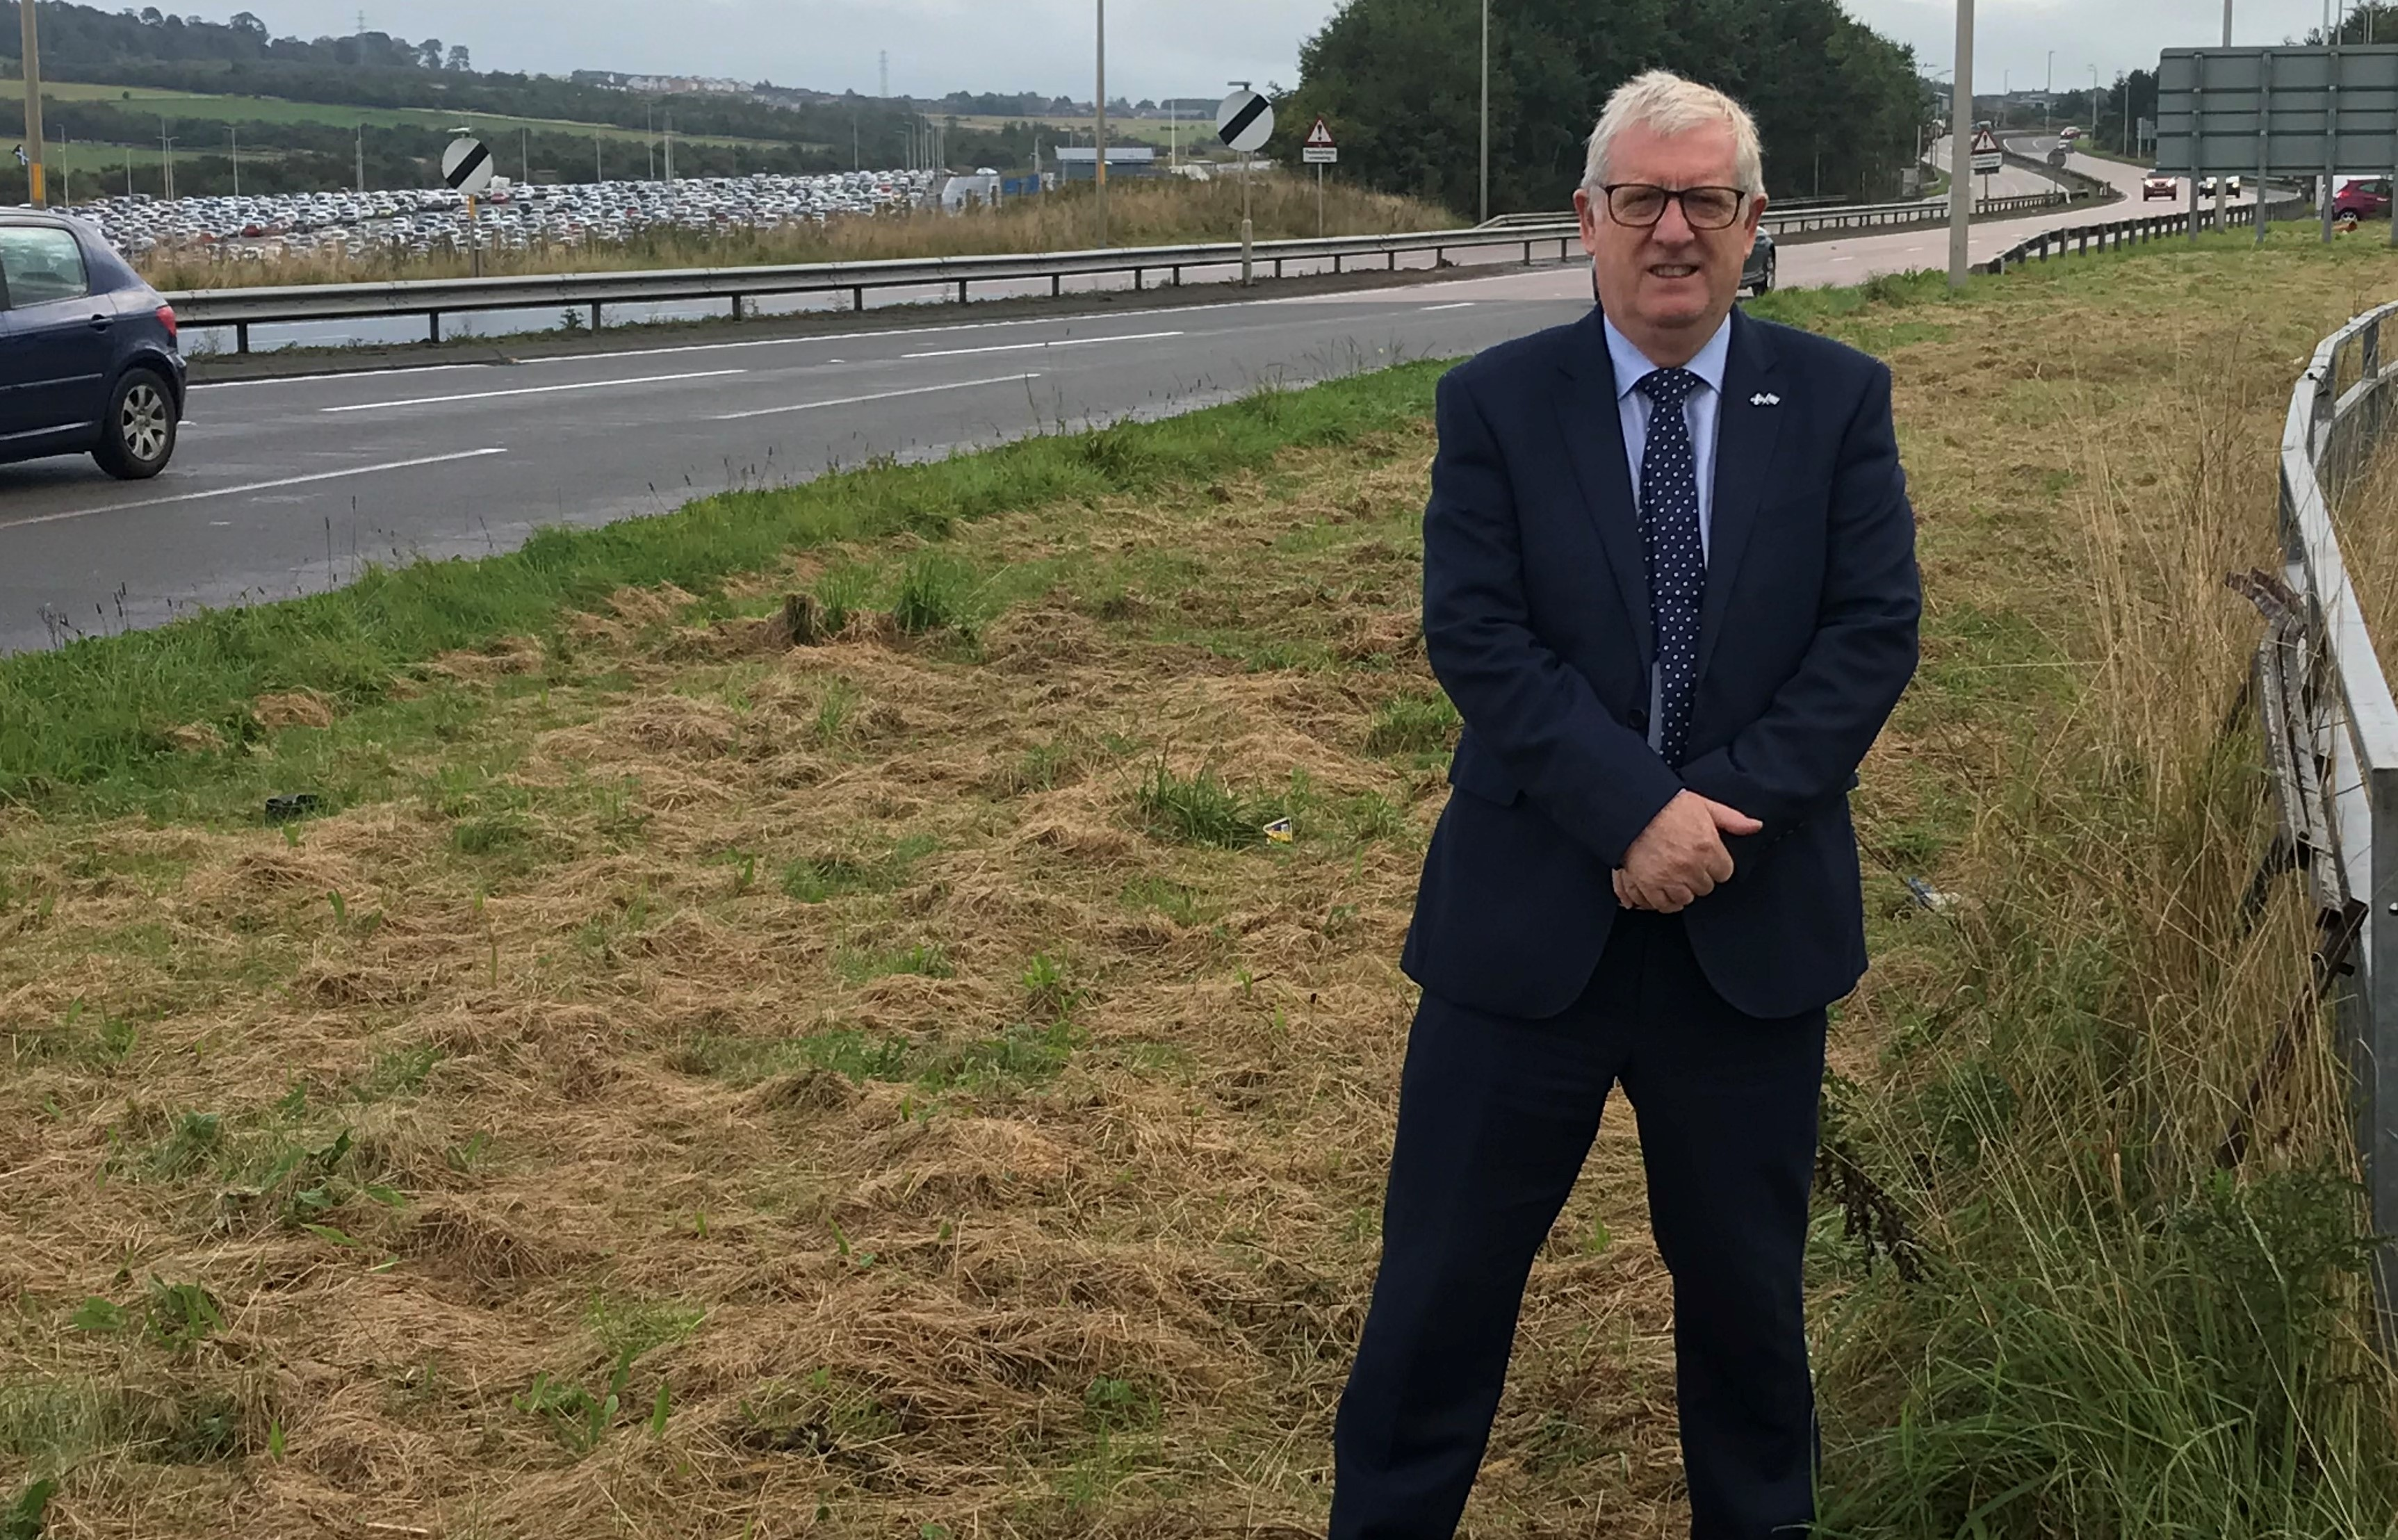 Dunfermline SNP MP Douglas Chapman.